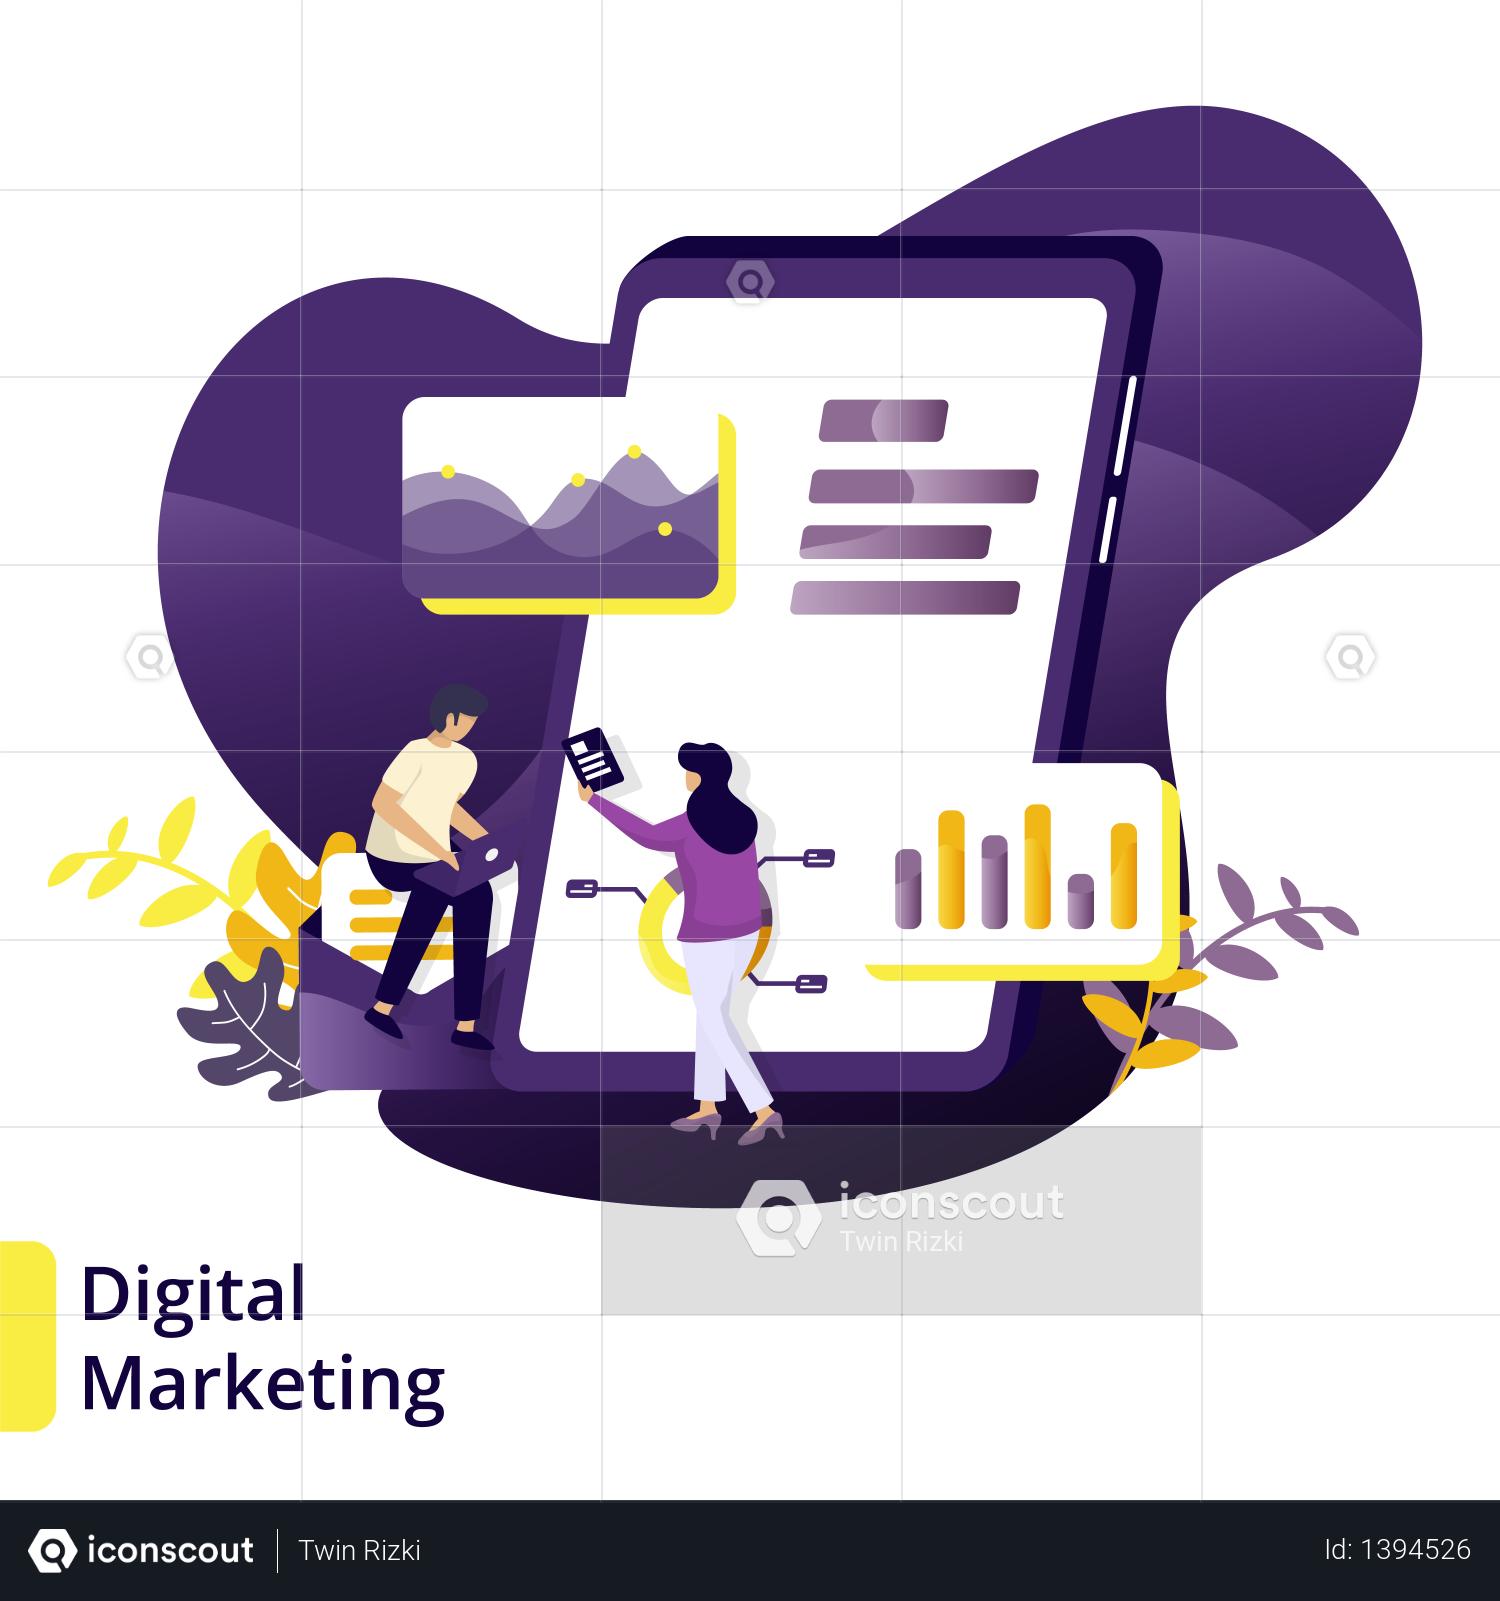 Premium Illustration Digital Marketing Illustration Download In Png Vector Format Digital Marketing Business Illustration Illustration